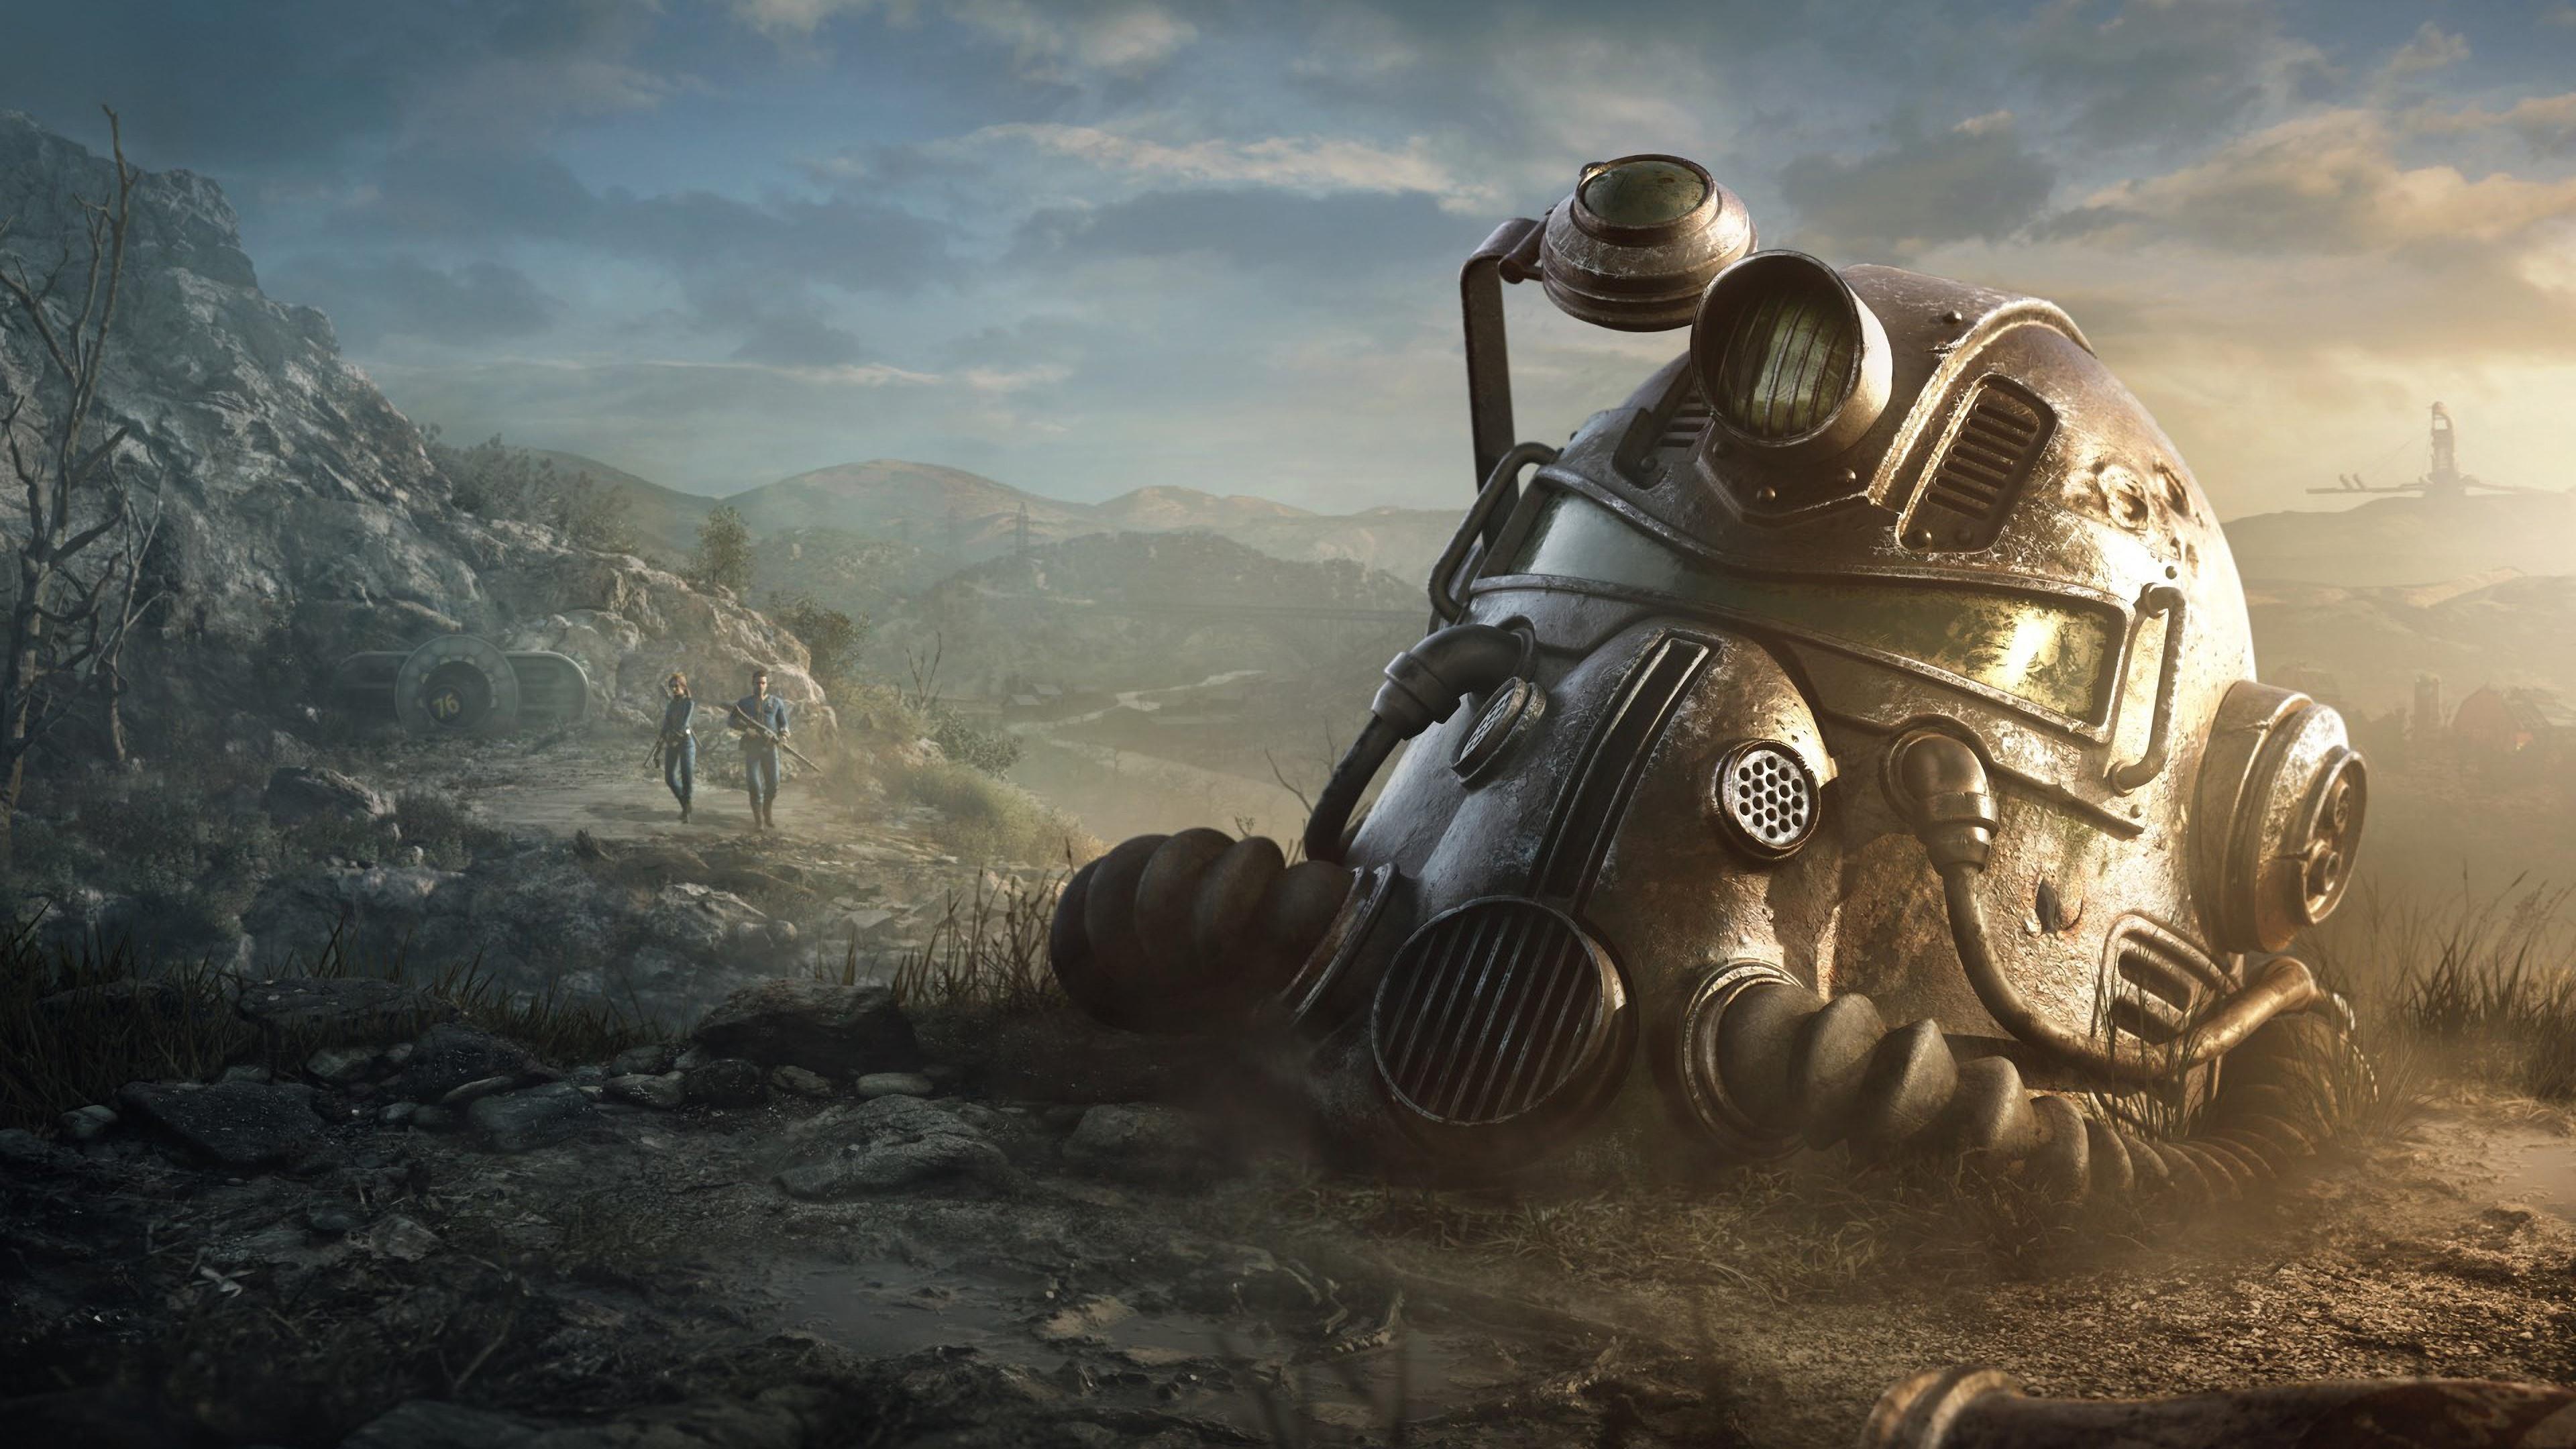 Wallpaper Fallout 4 Helmet 3840x2160 Uhd 4k Picture Image